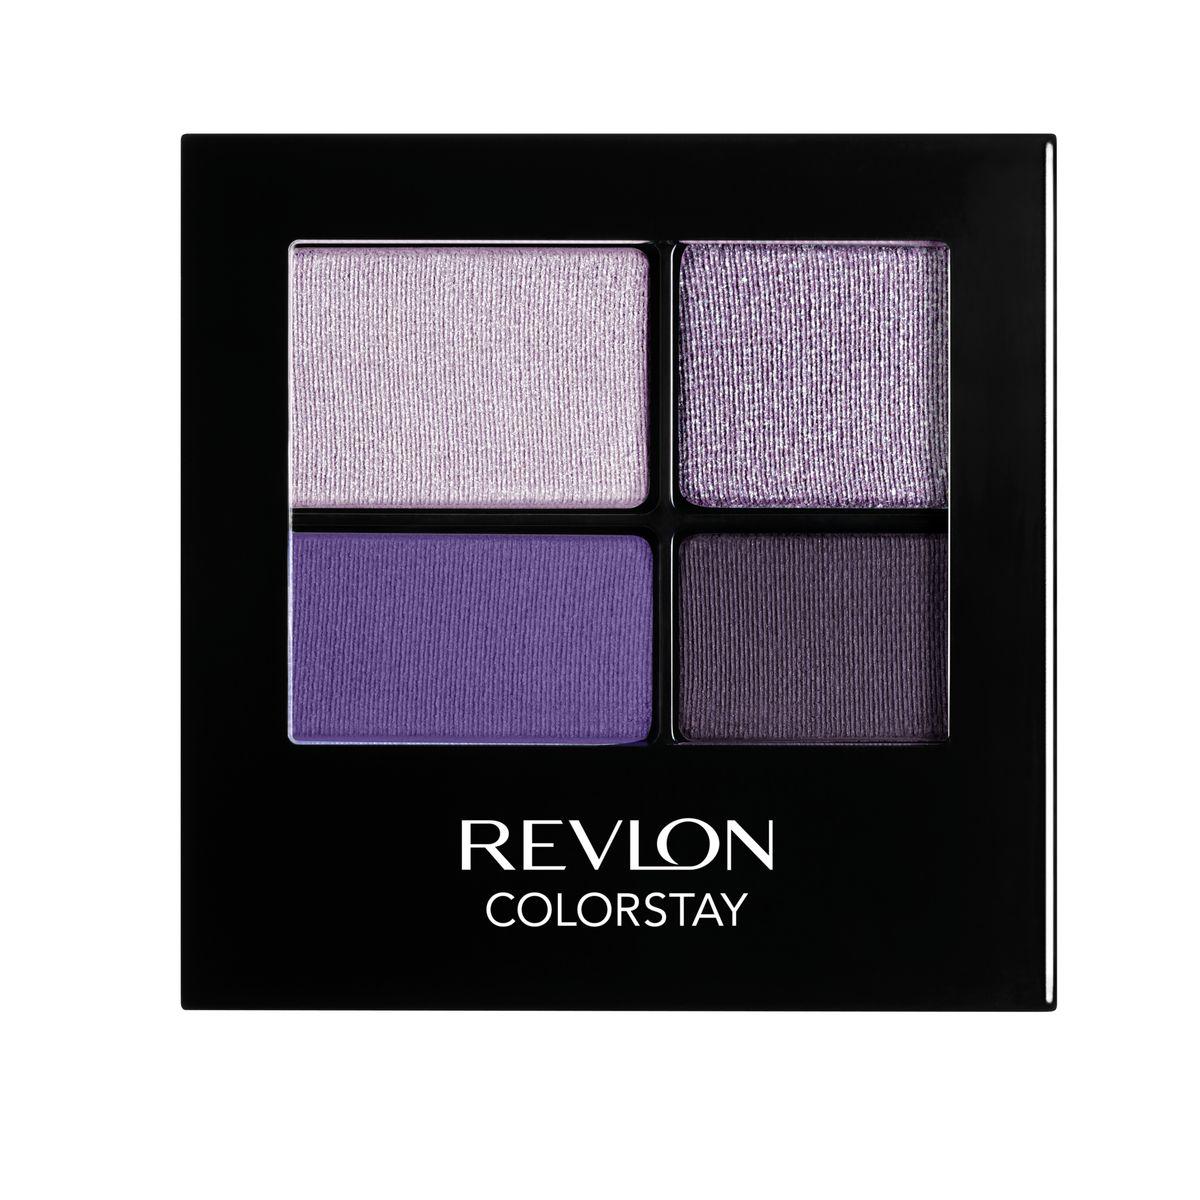 заказать Revlon Тени для Век Четырехцветные Colorstay Eye16 Hour Eye Shadow Quad Seductive 530 42 г